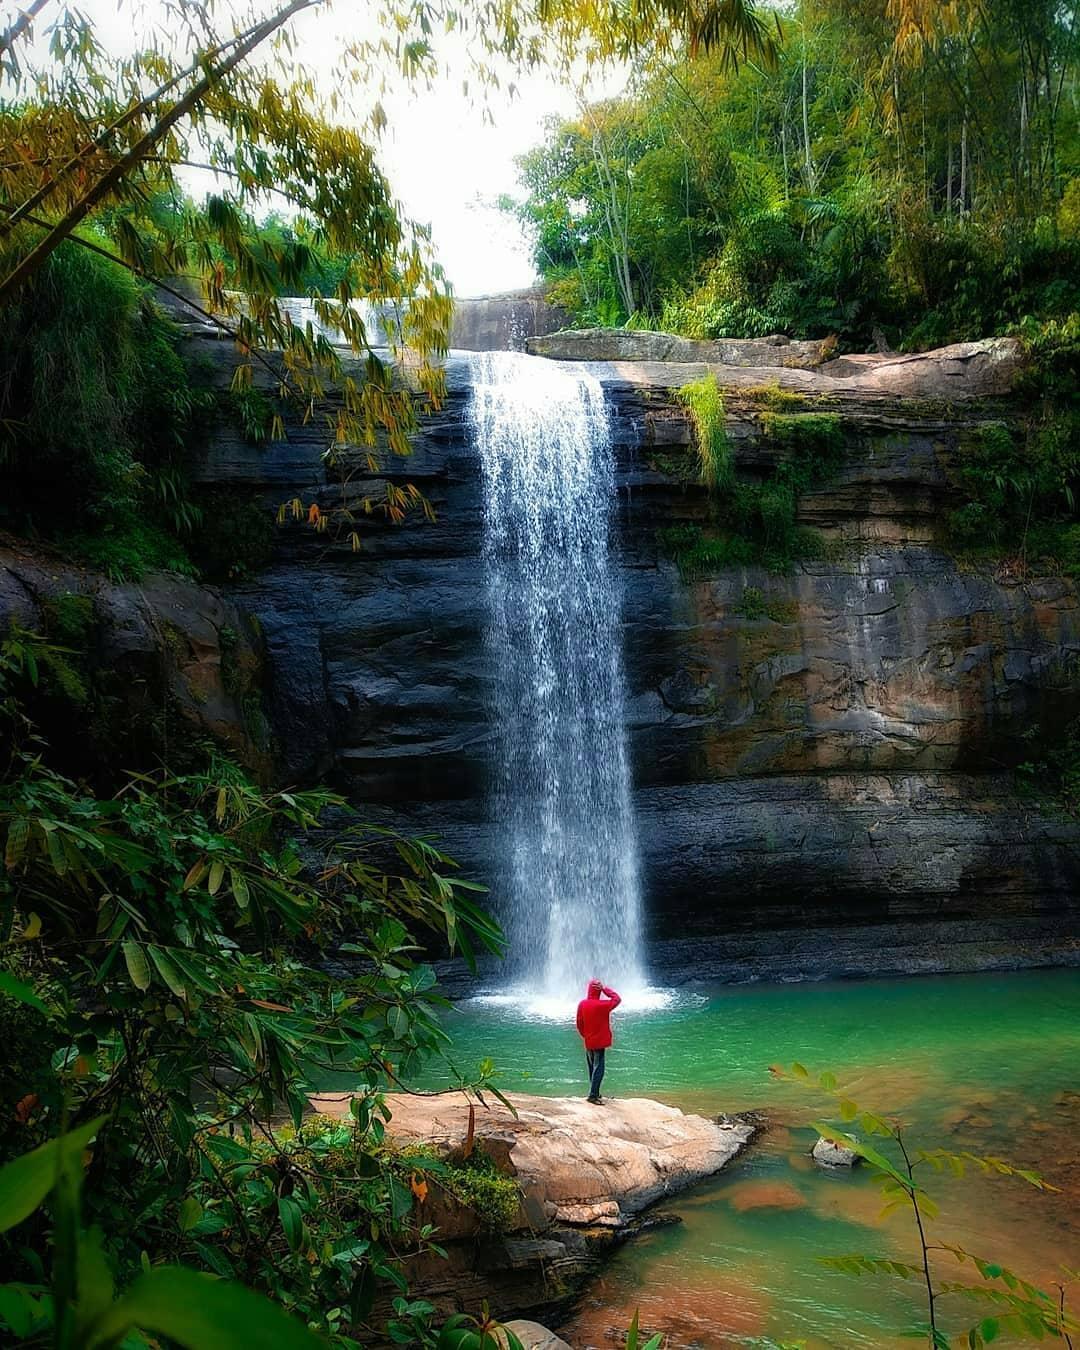 Curug Nangga Wisata Alam Tersembunyi Di Banyumas Jawa